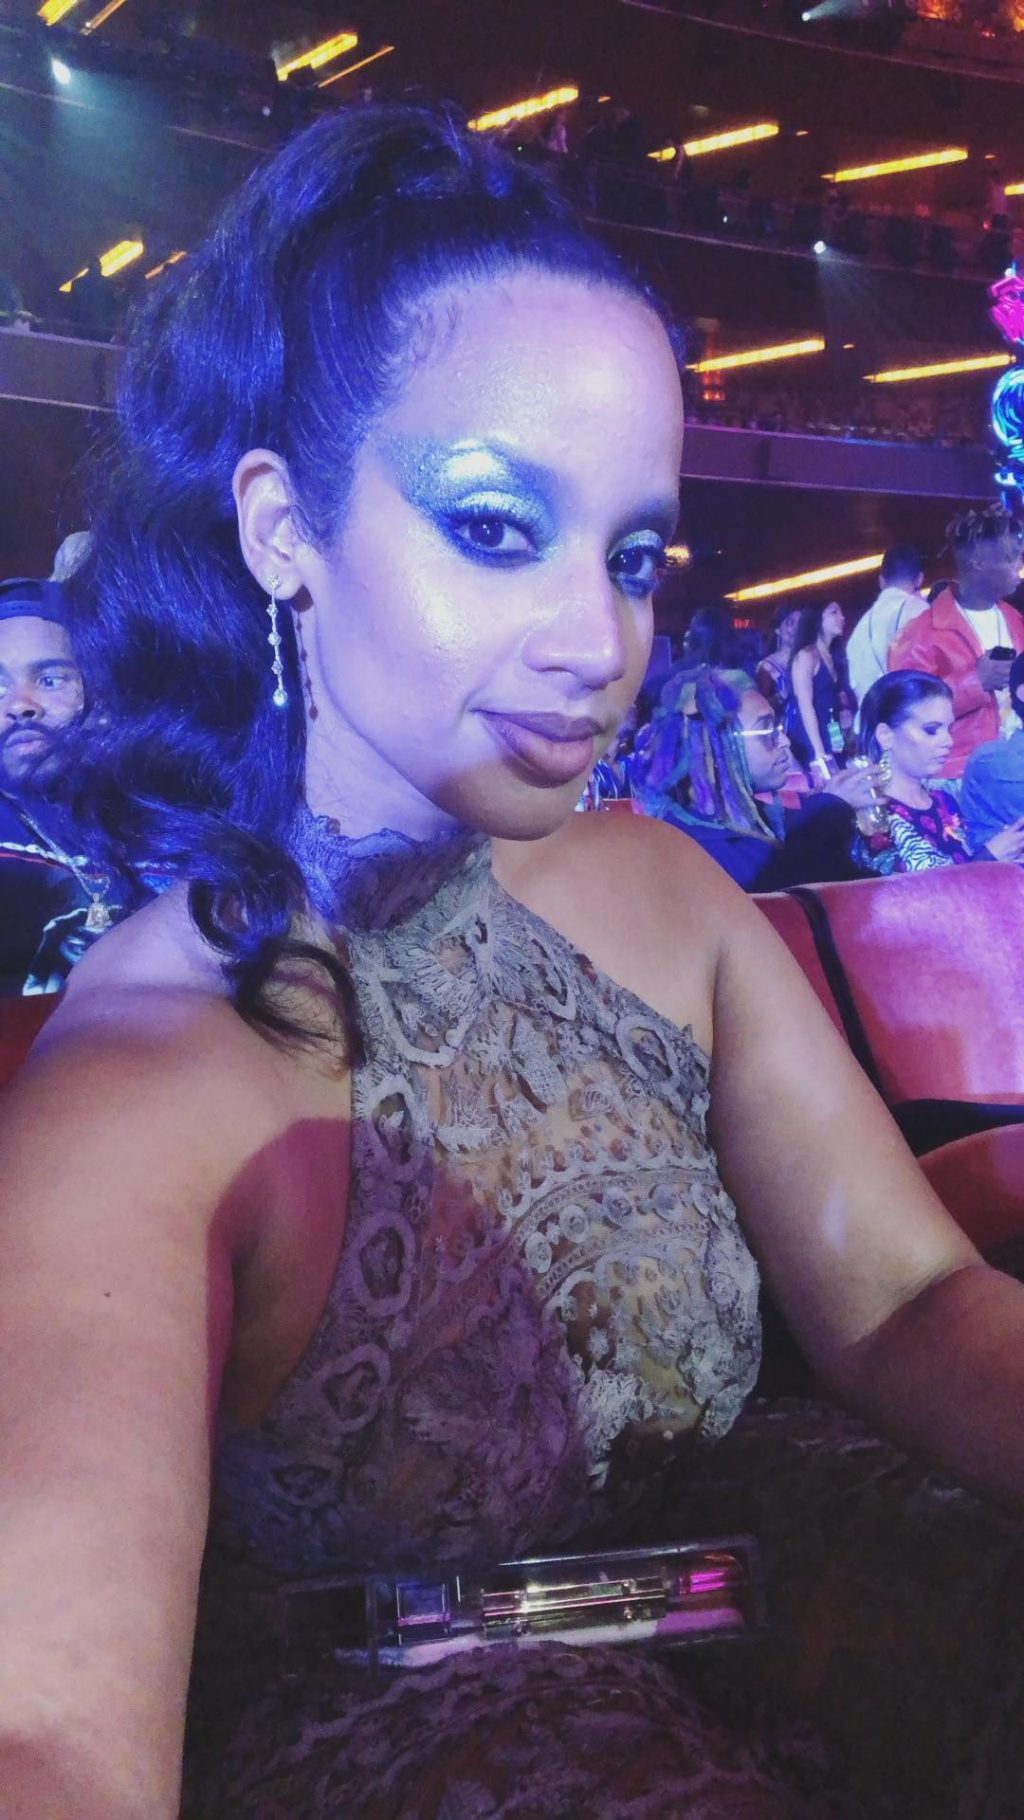 Dascha Polanco Erotic  The Fappening Leaked Photos 20152019